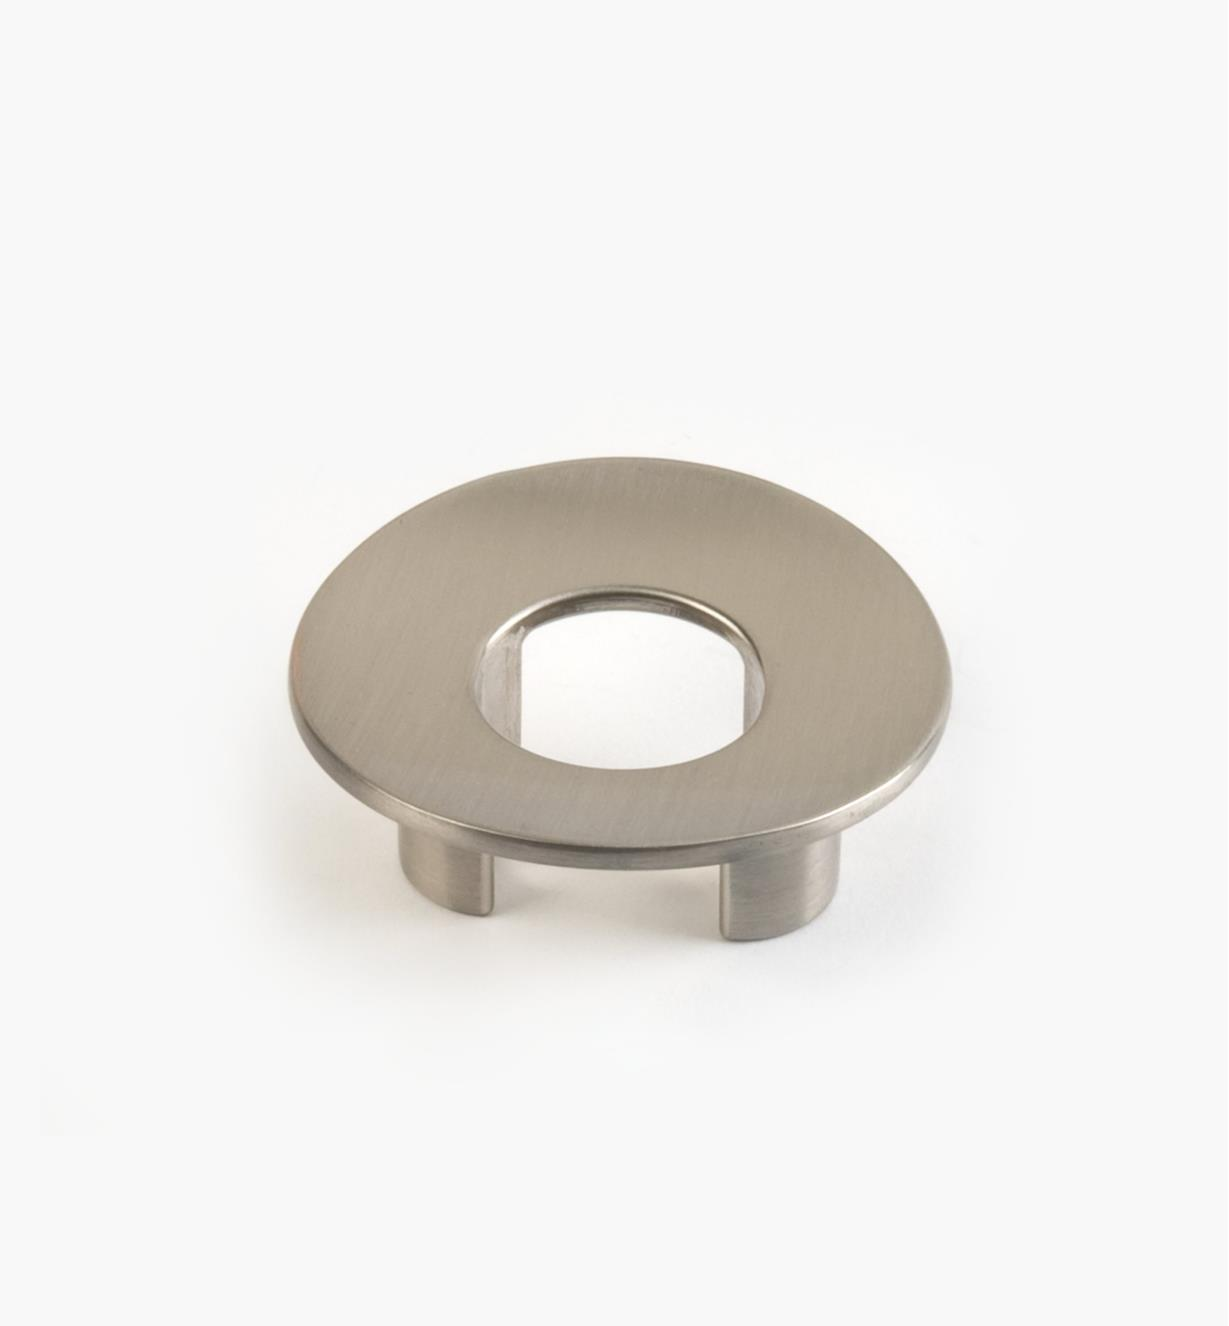 01G1643 - 32mm x 24mm Brushed Nickel Round Ventana Pull